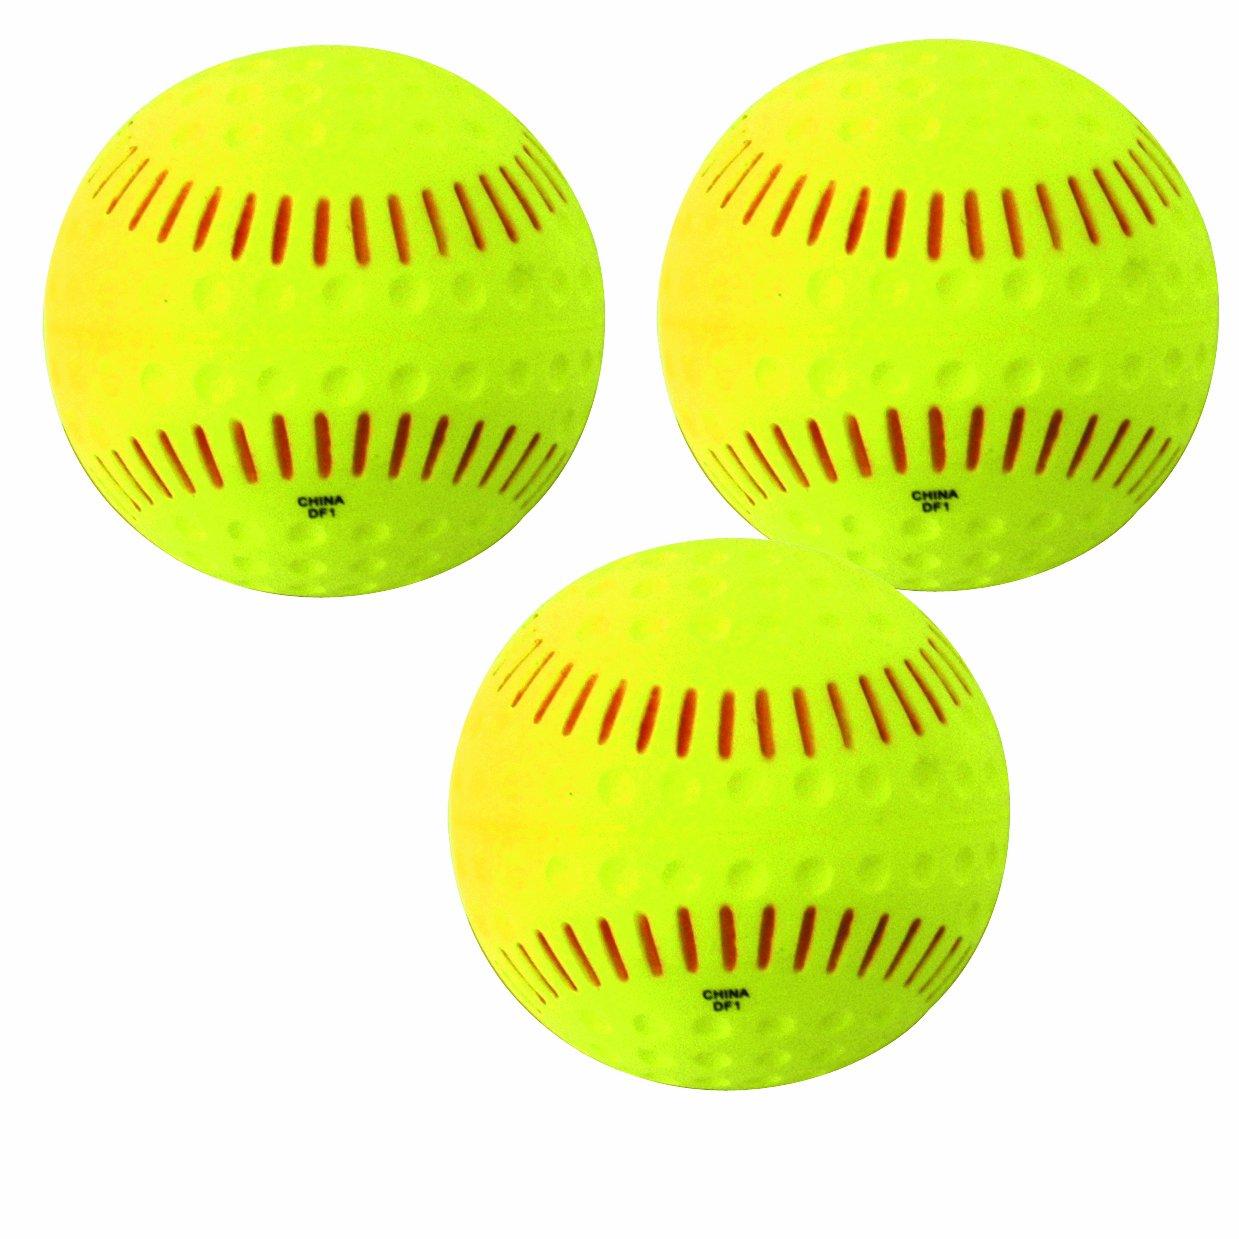 3Pk Baden Unisex Ssbr Feather Lite Softball Yellow